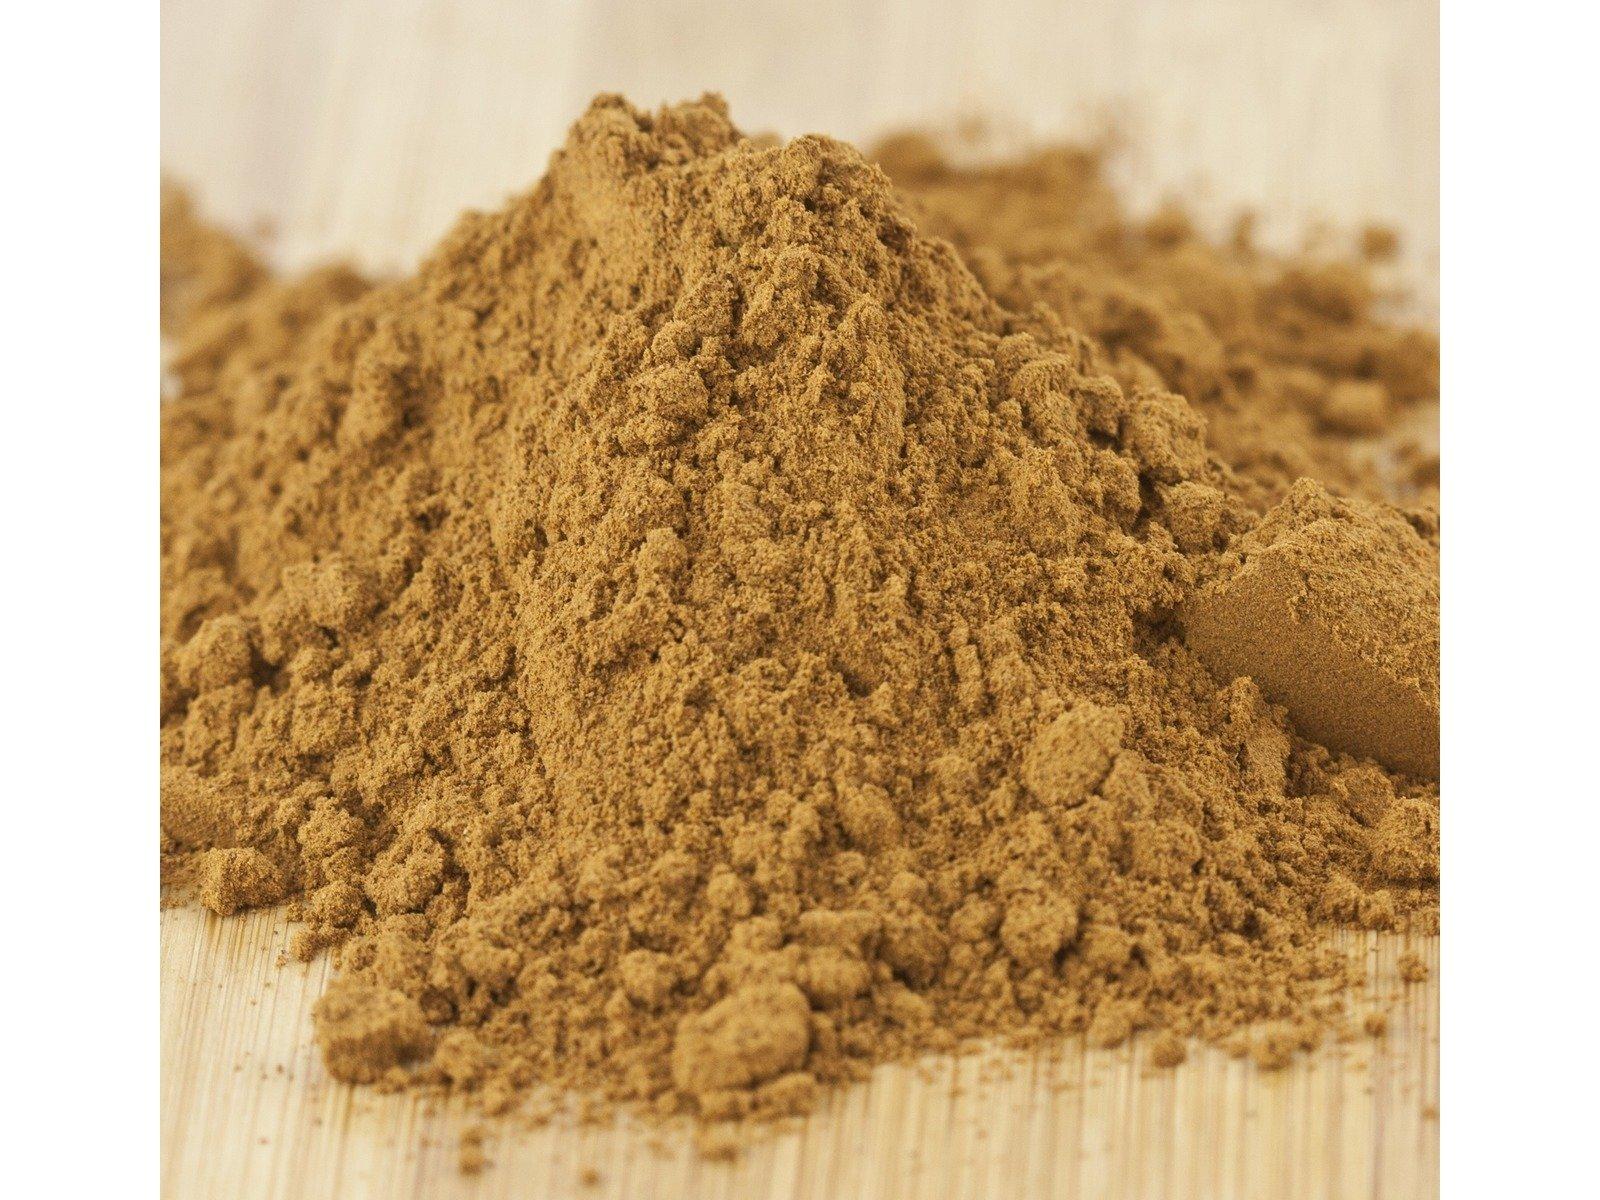 Ground Cinnamon 2% Volatile Oil 100 lbs.